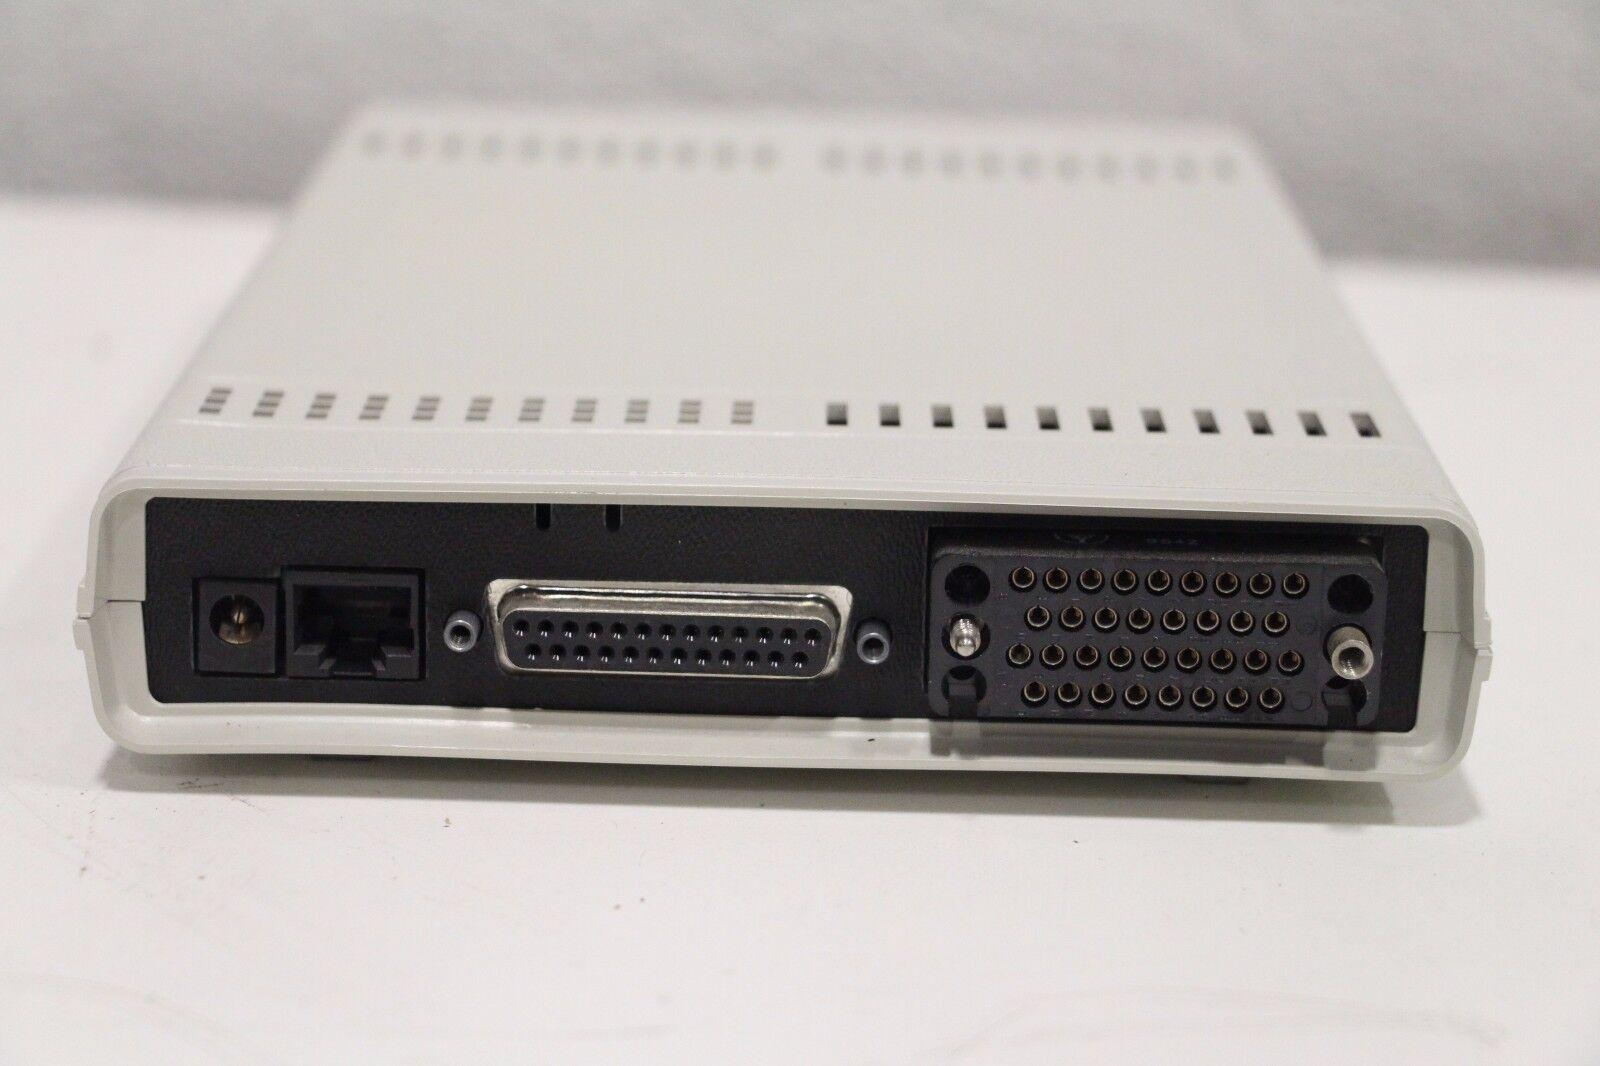 Best Wired Router 20701 - WIRE Center •